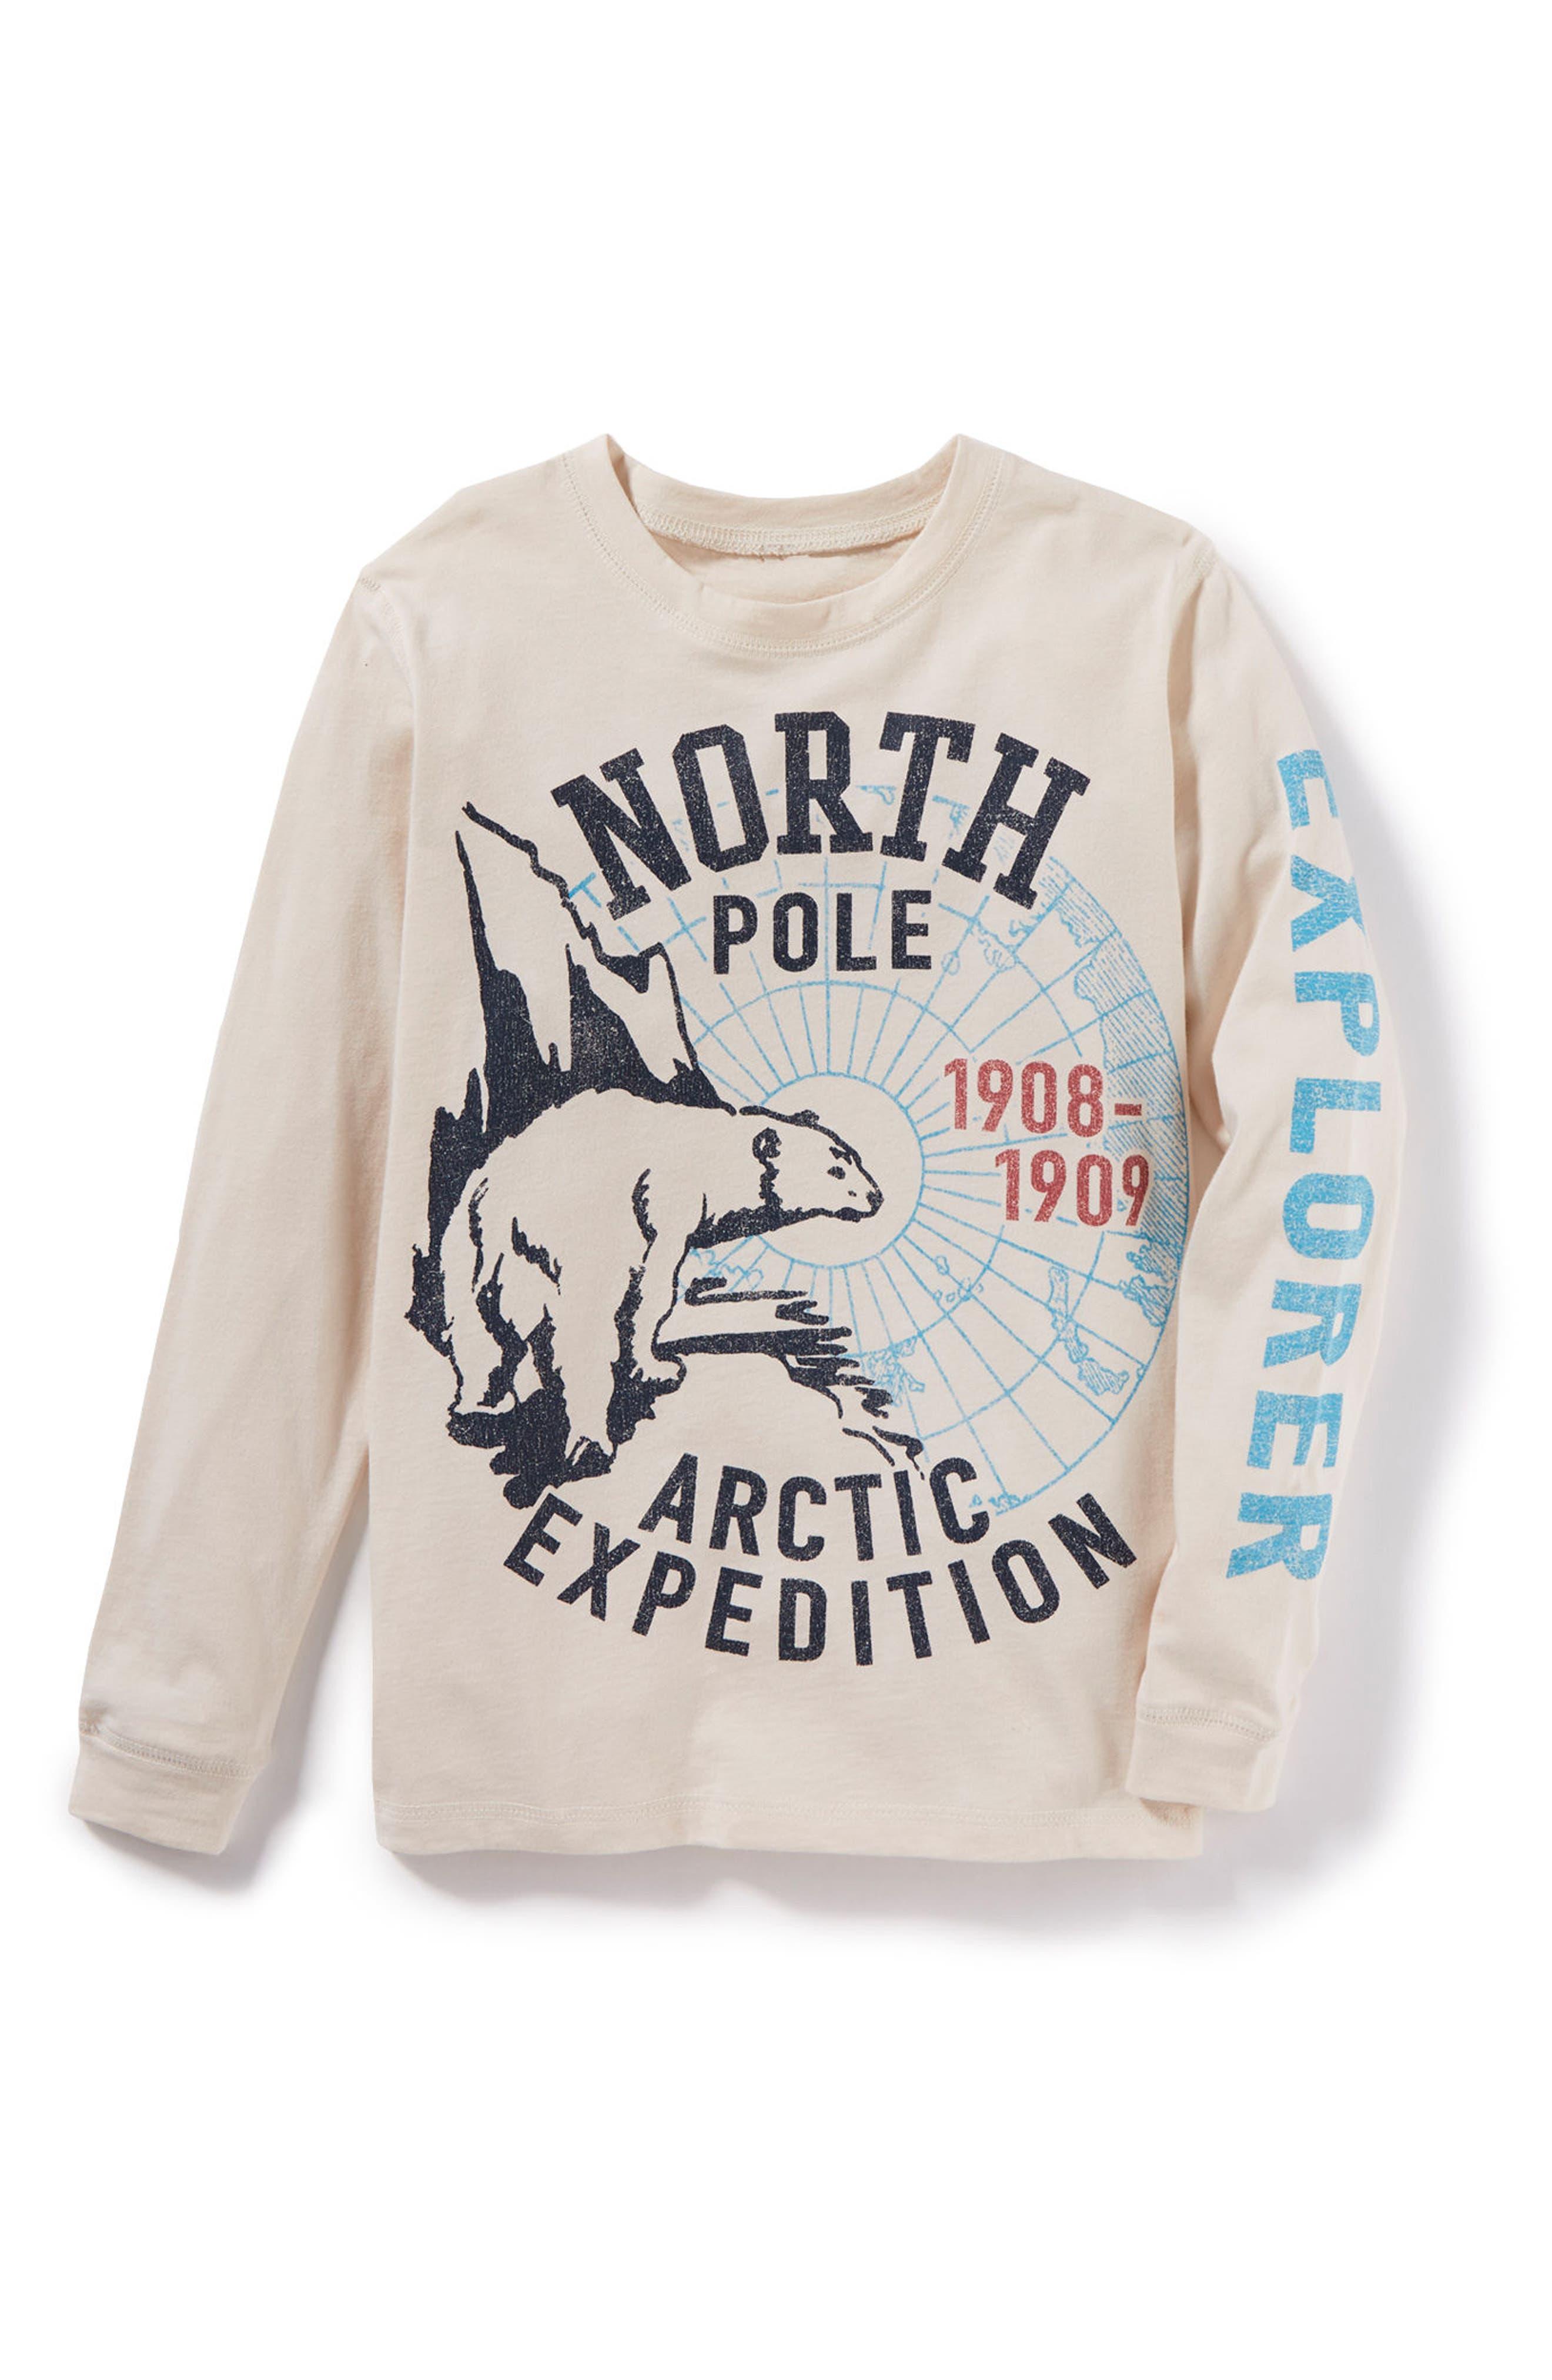 Alternate Image 1 Selected - Peek Arctic Expedition Graphic Long Sleeve T-Shirt (Toddler Boys, Little Boys & Big Boys)